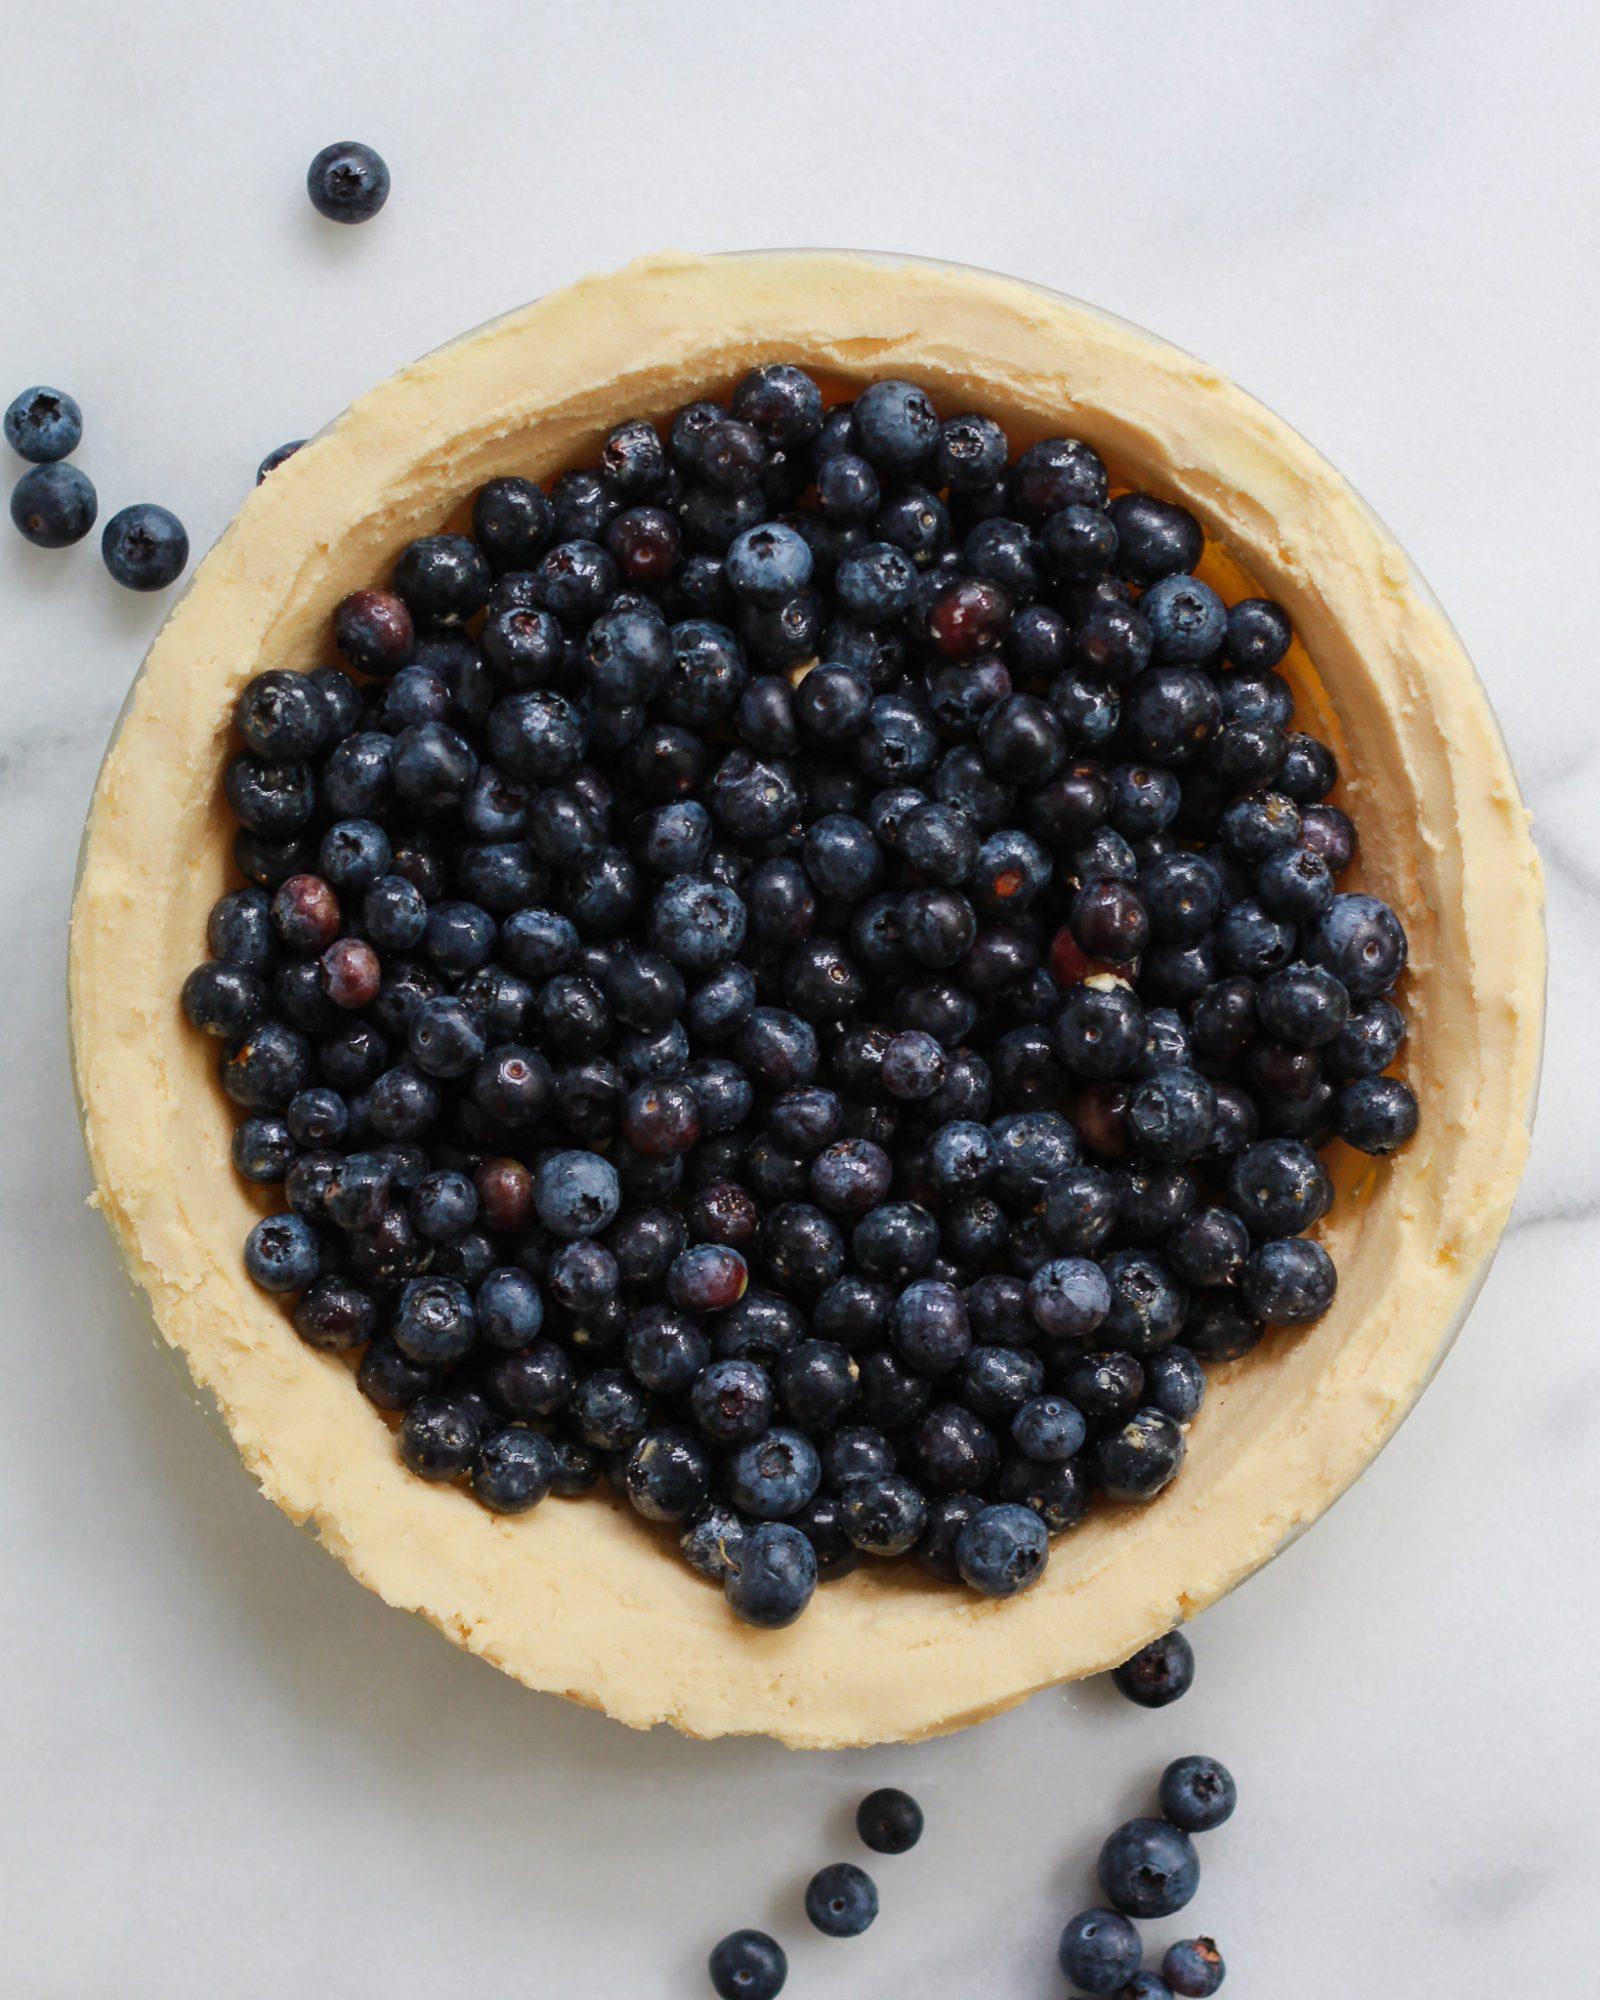 blueberry pie filling in crust